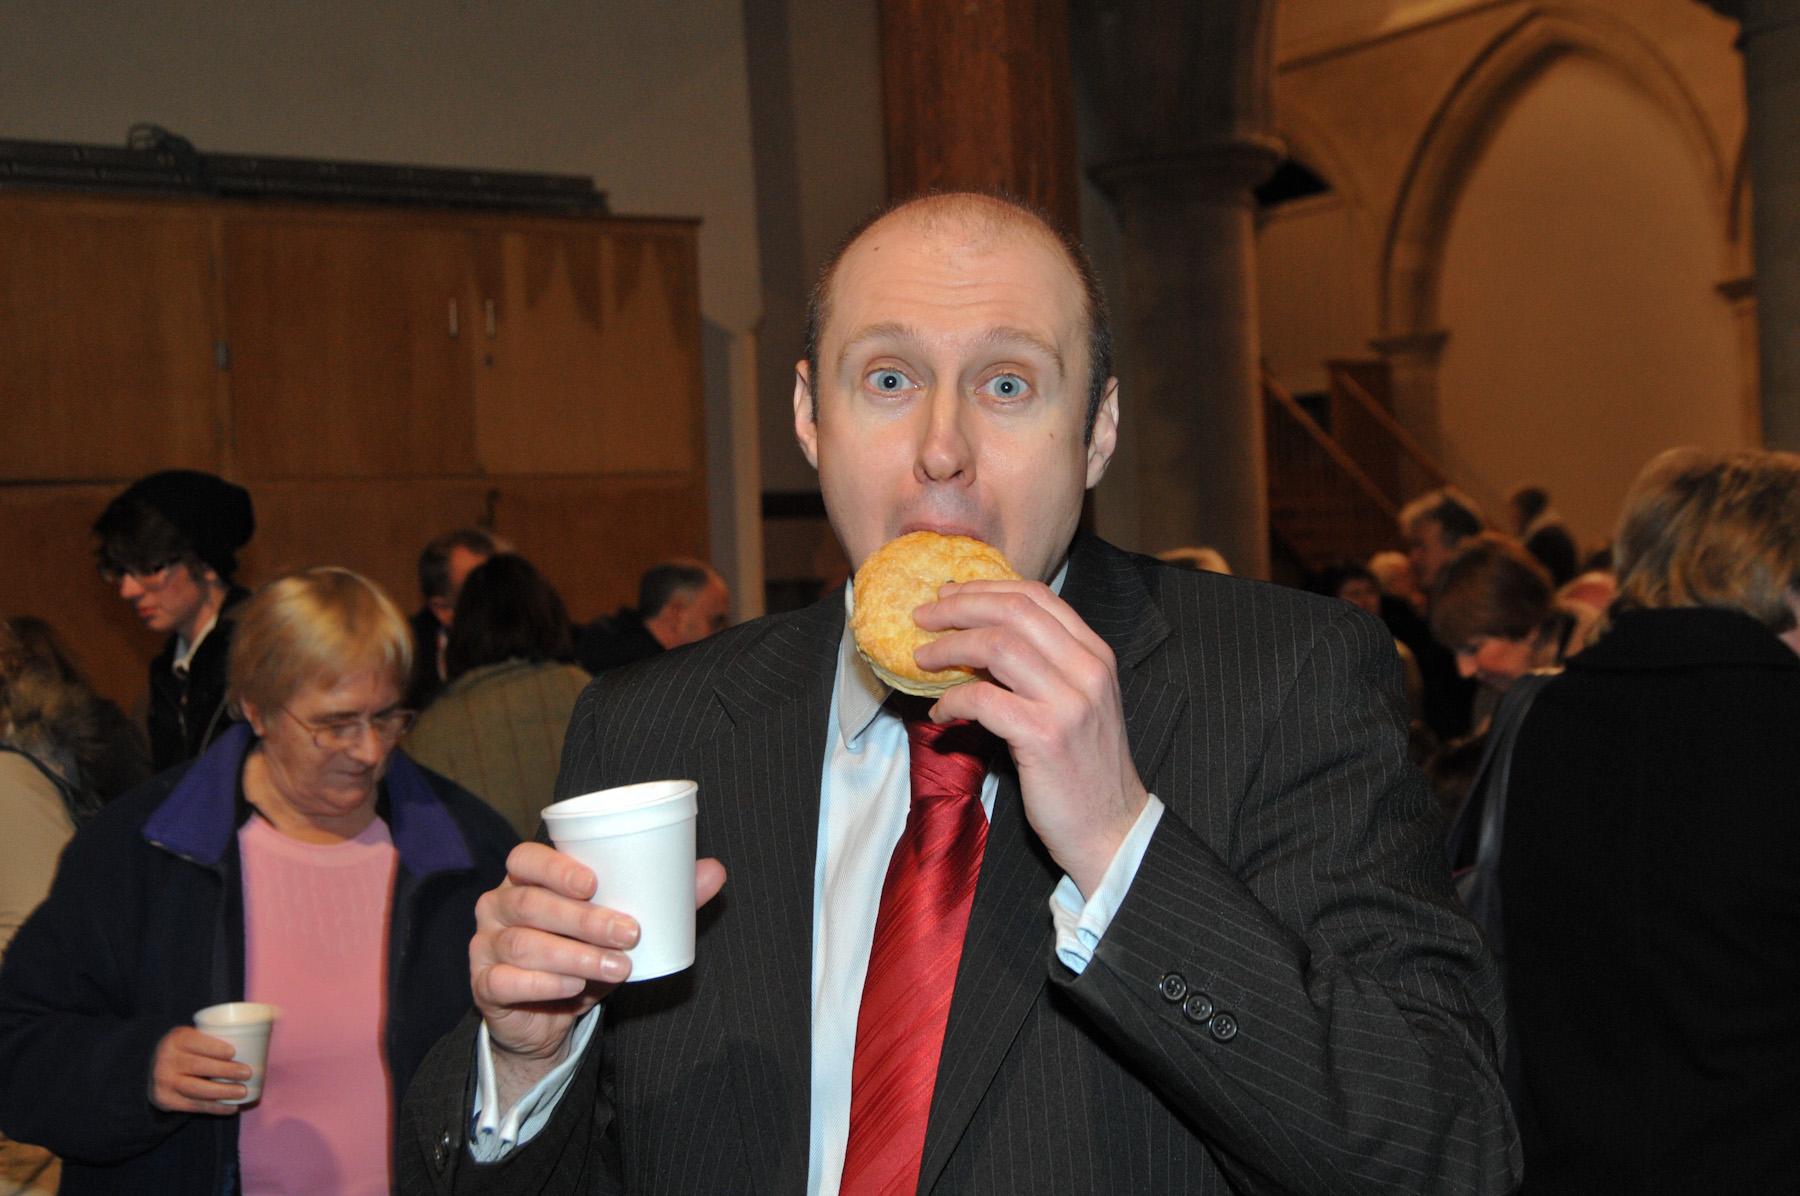 Neil Quigley enjoying the festive Spirit